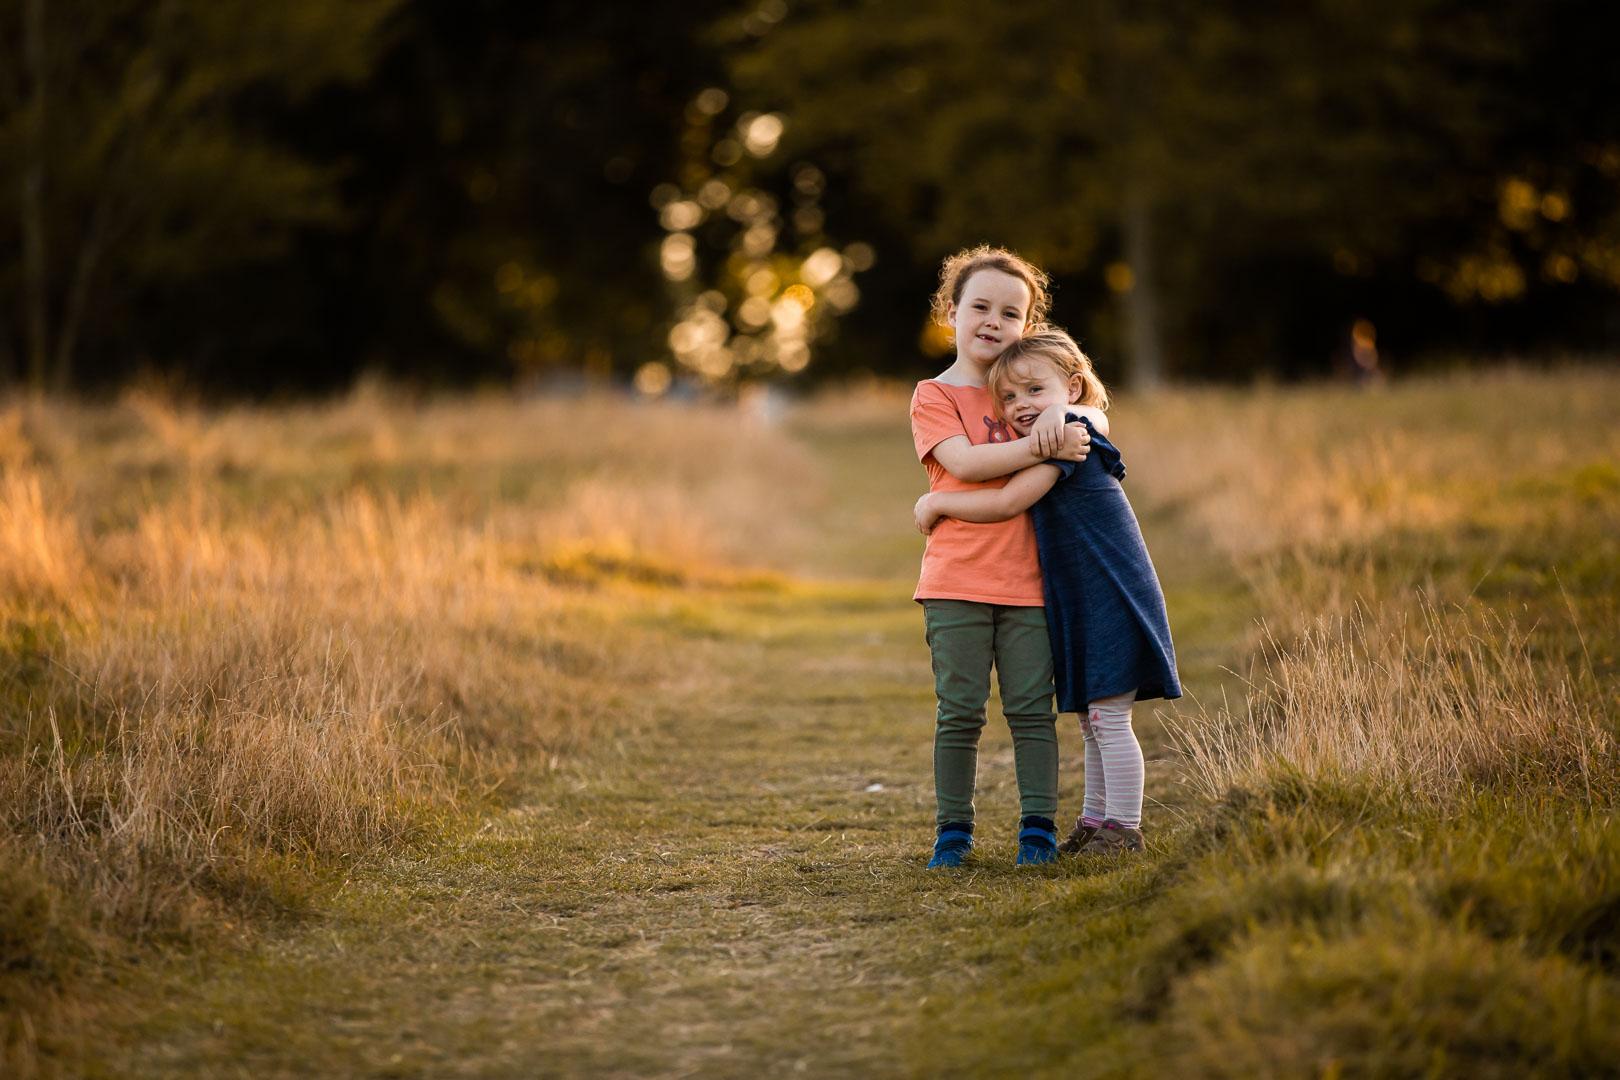 Family photographer London, Brockwell Park